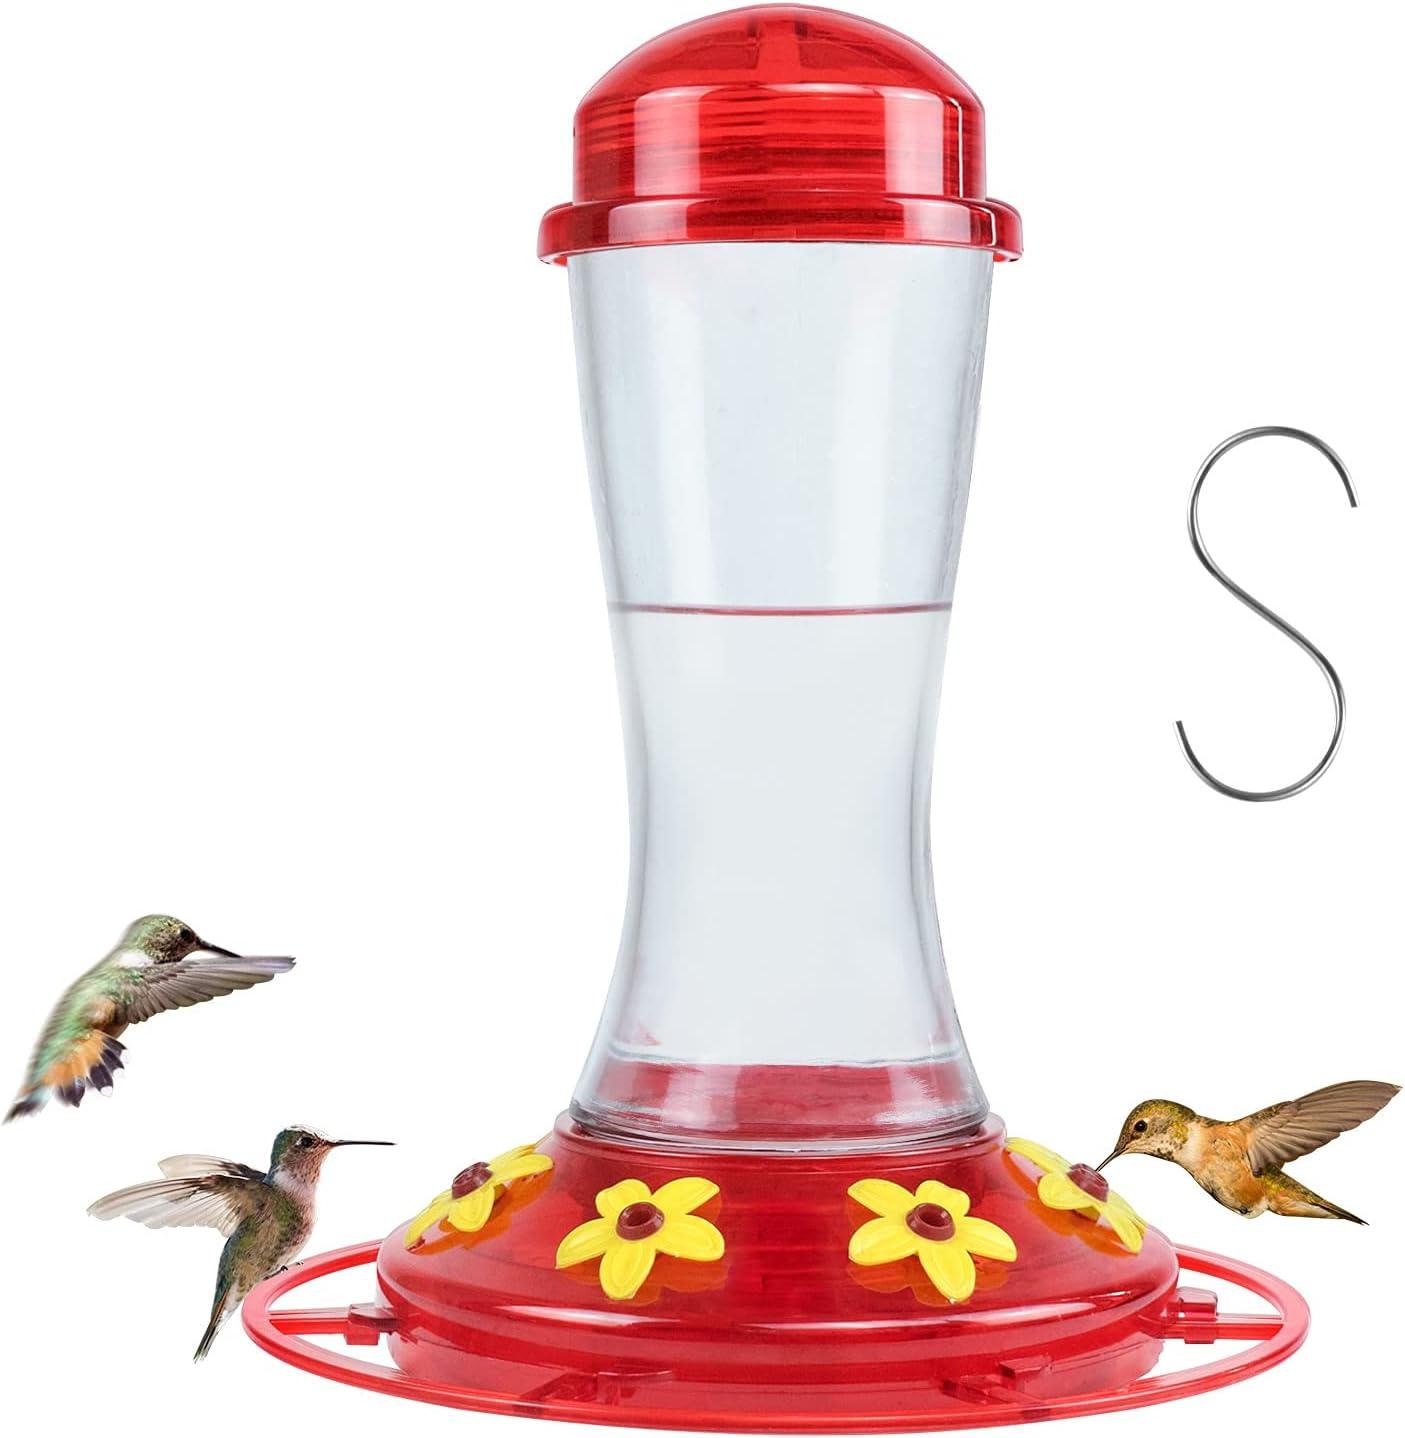 HOTOZON Hummingbird Feeder for Outdoors, Pinch Waist Glass Bottle, Circular Perch with 7 Feeding Ports, 19 Ounces, Red